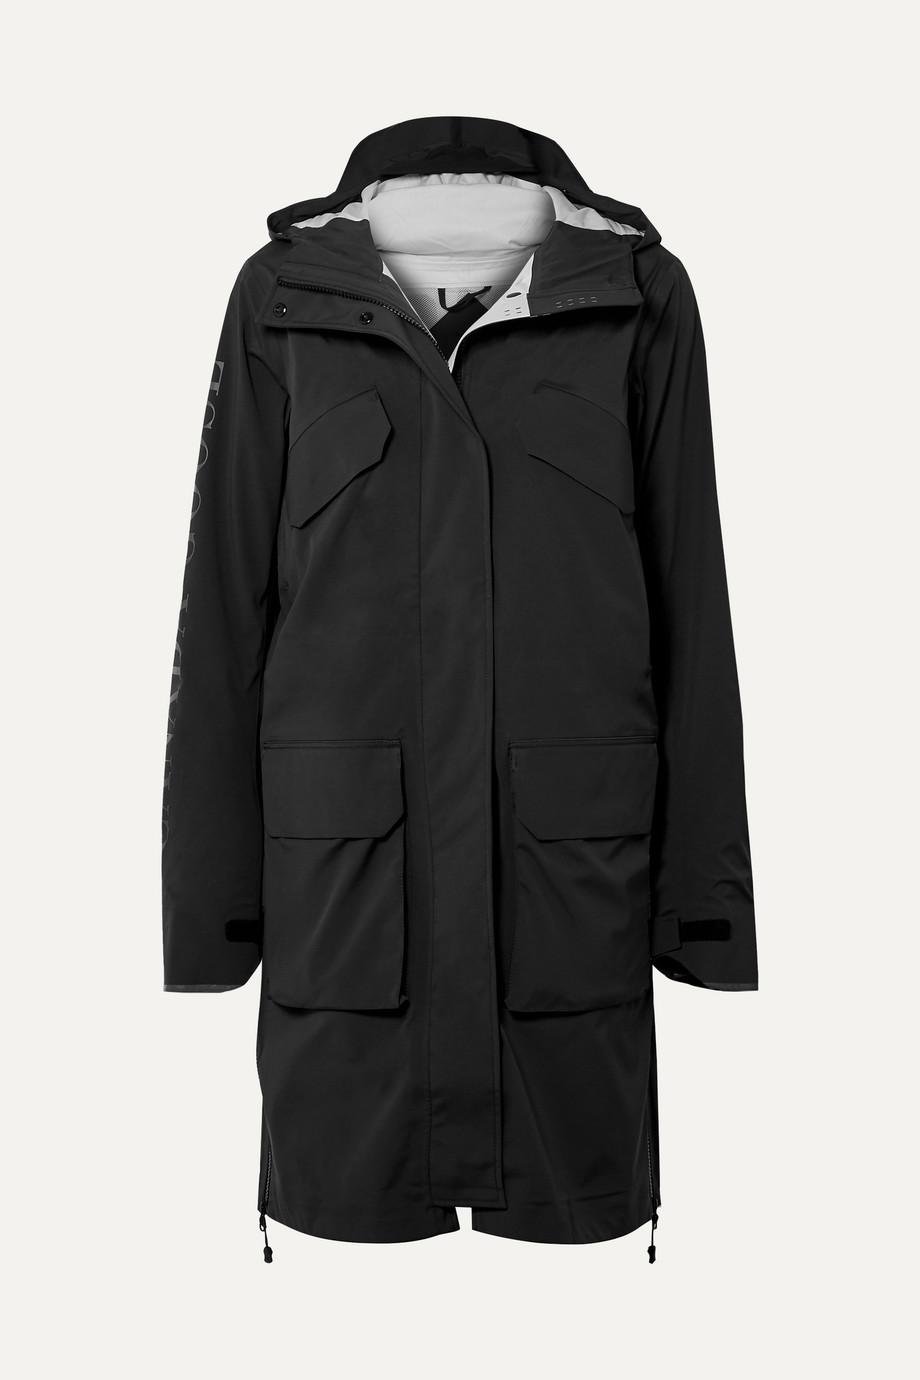 Canada Goose Seaboard hooded shell jacket